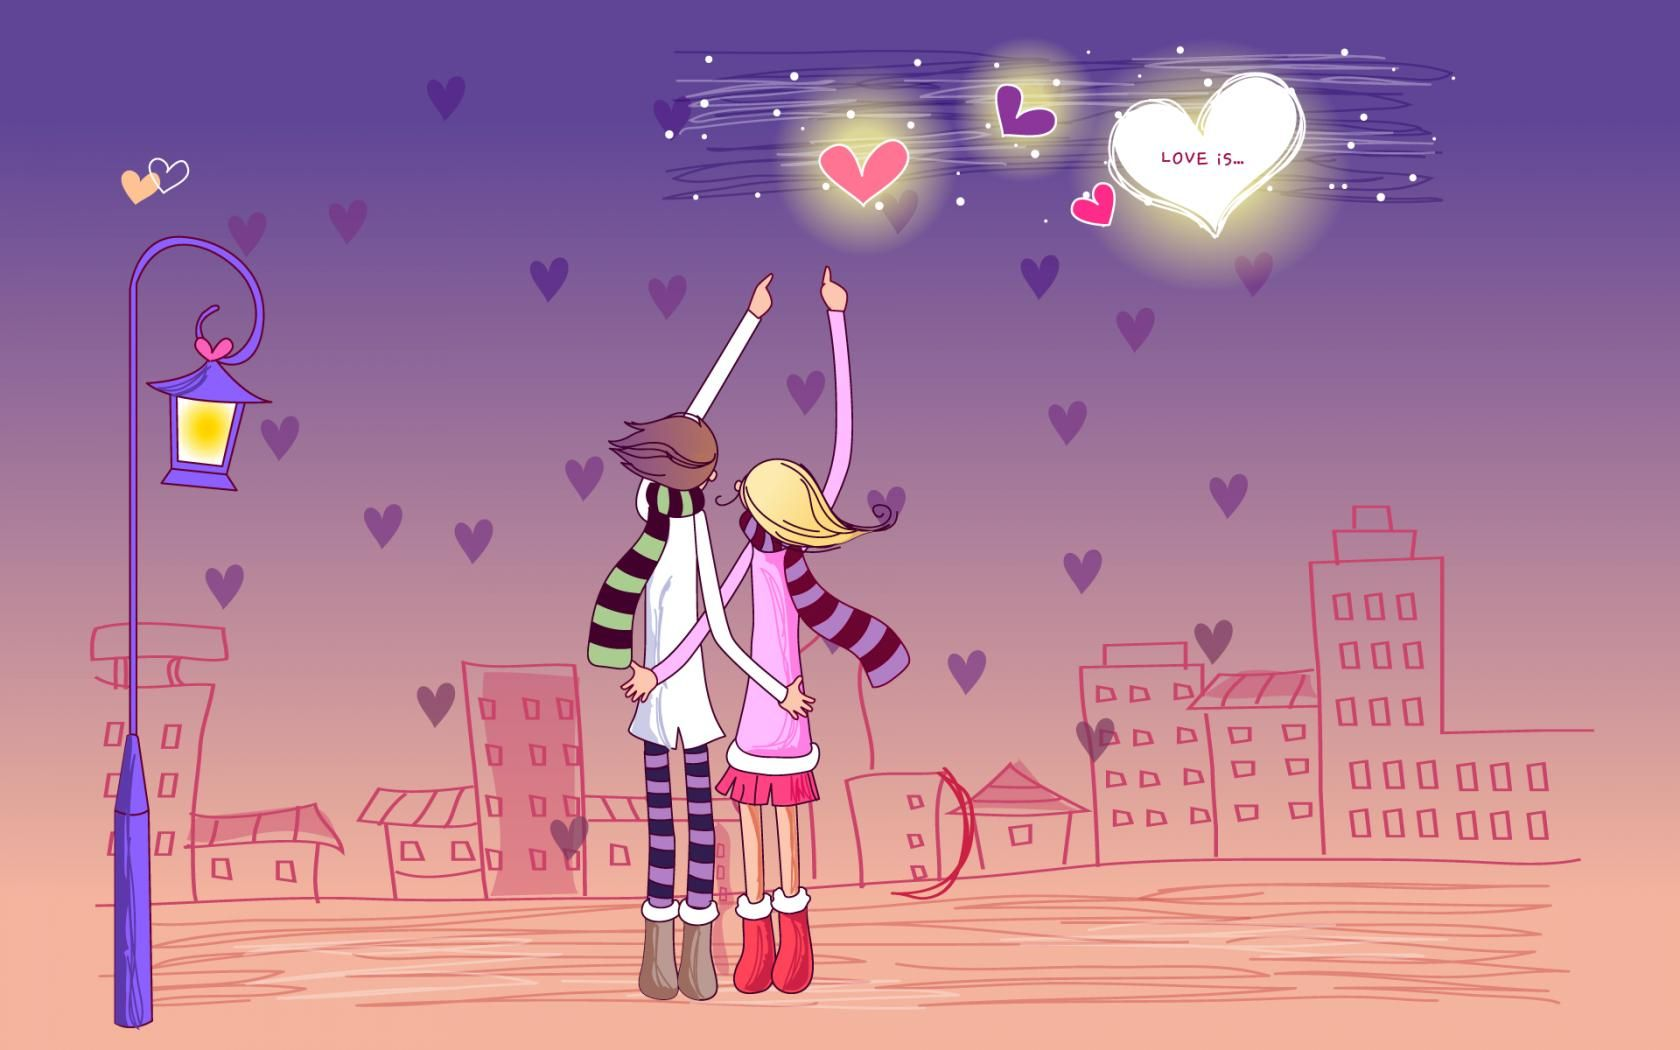 Fondos De Pantalla Amistad Para Fondo Celular En Hd 13 Hd Wallpapers Fondos De Pantalla De Parejas Enamoradas Dibujos De Amor Dia De San Valentin